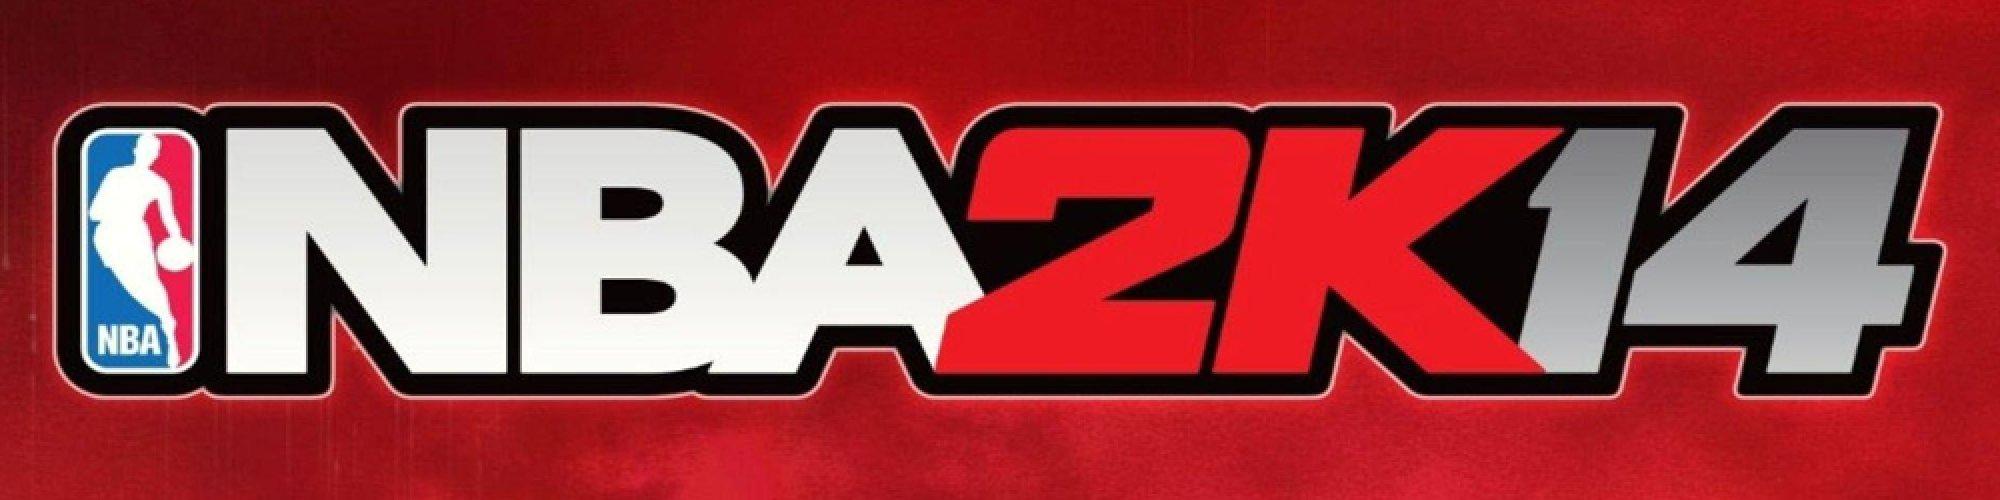 NBA 2K14 banner